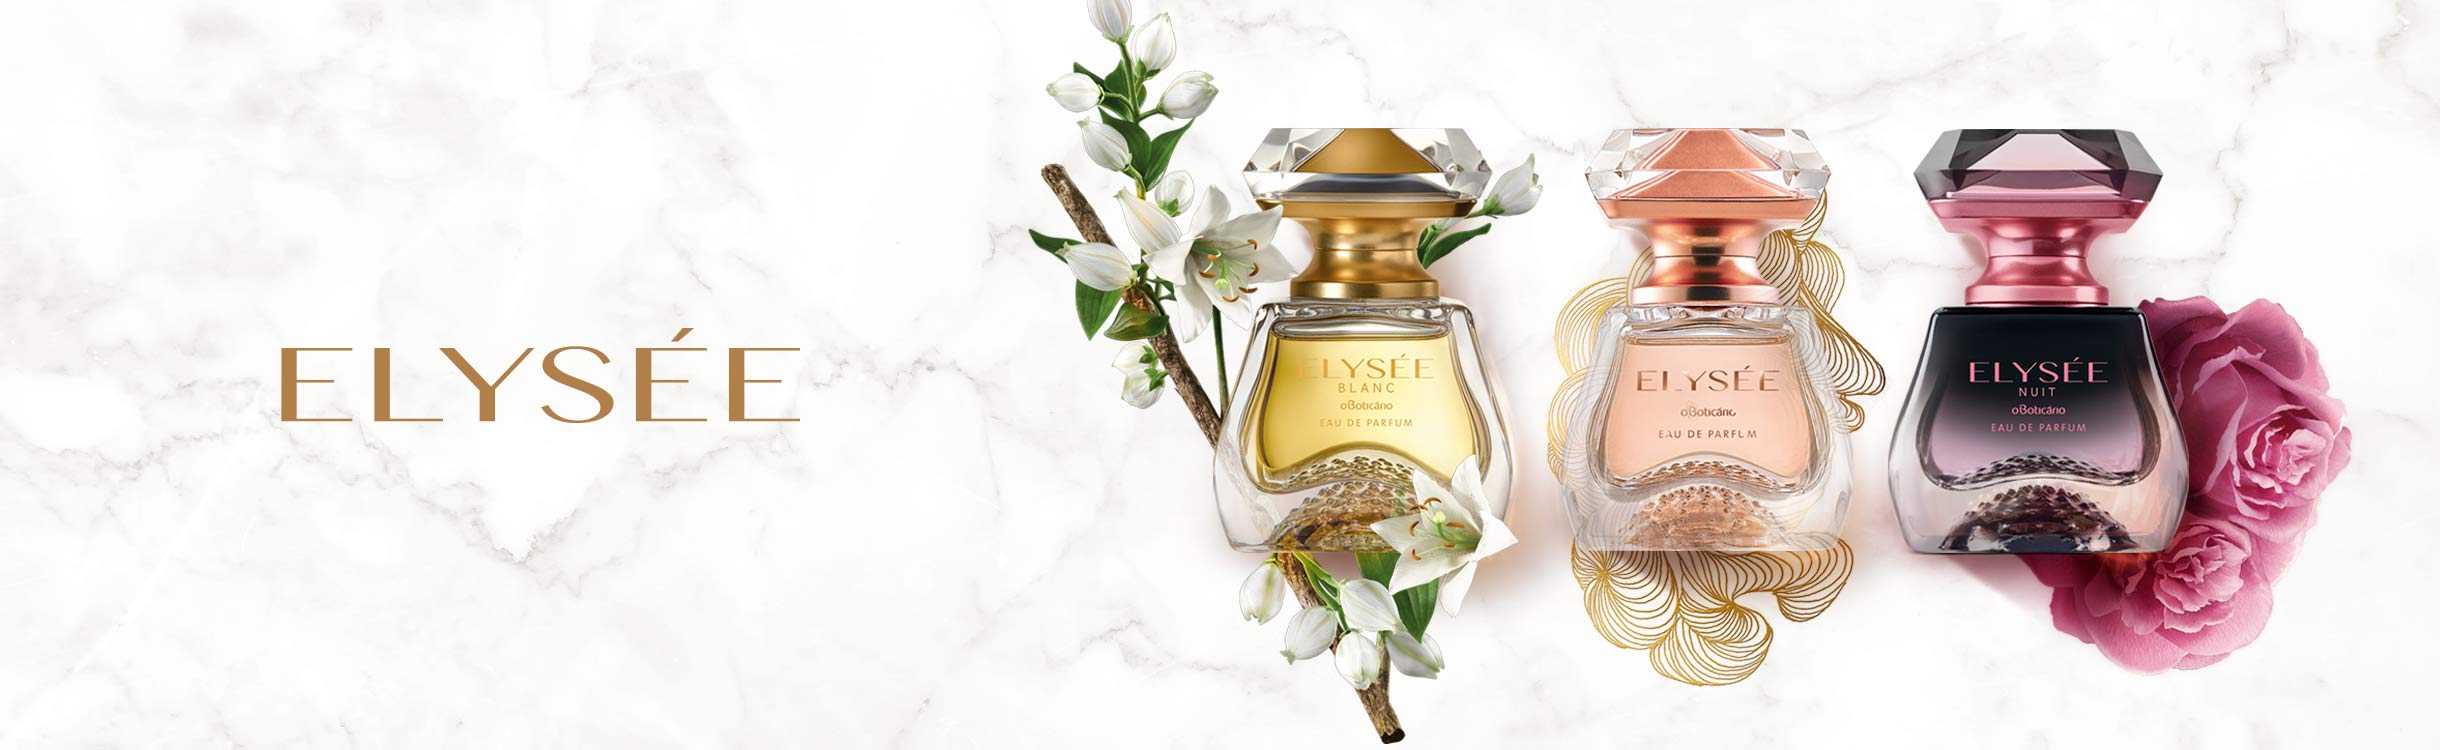 Elysée Perfumaria Kits para Presente